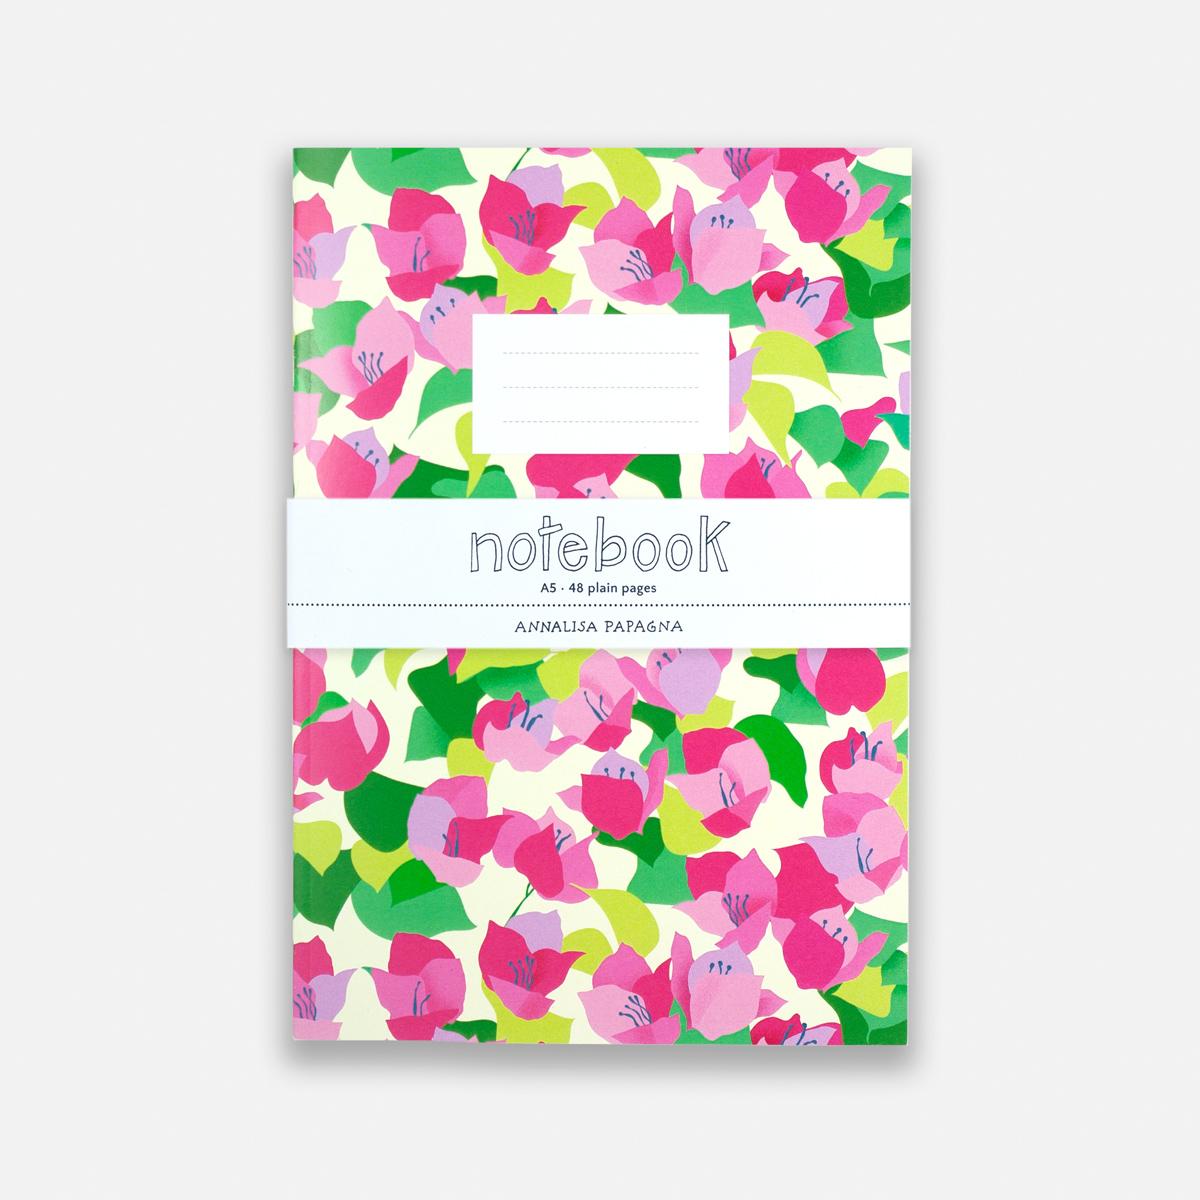 Annalisa Papagna shop - Bougainvillea notebook 2